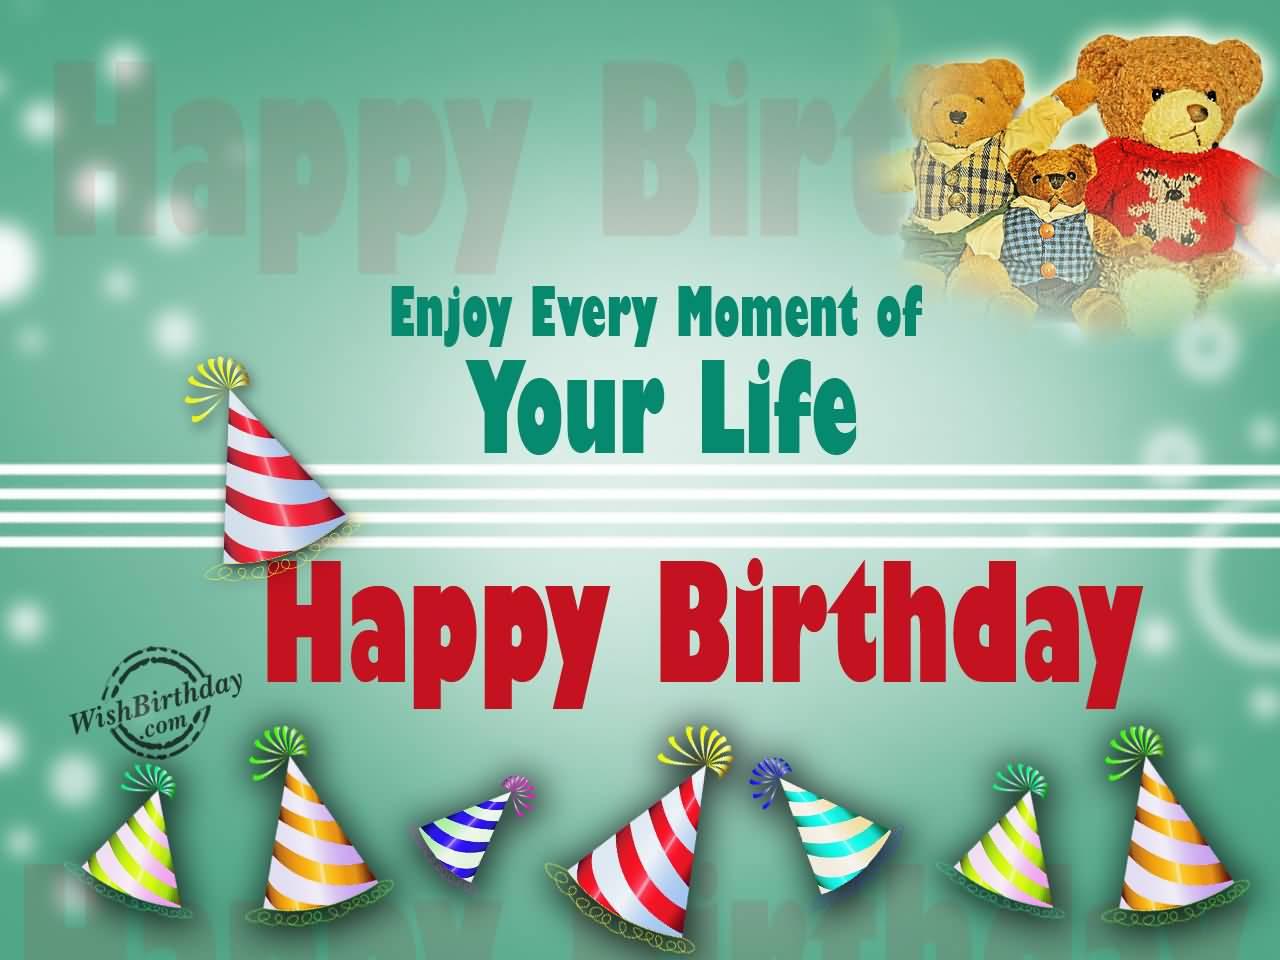 share your birthday wishes - photo #42